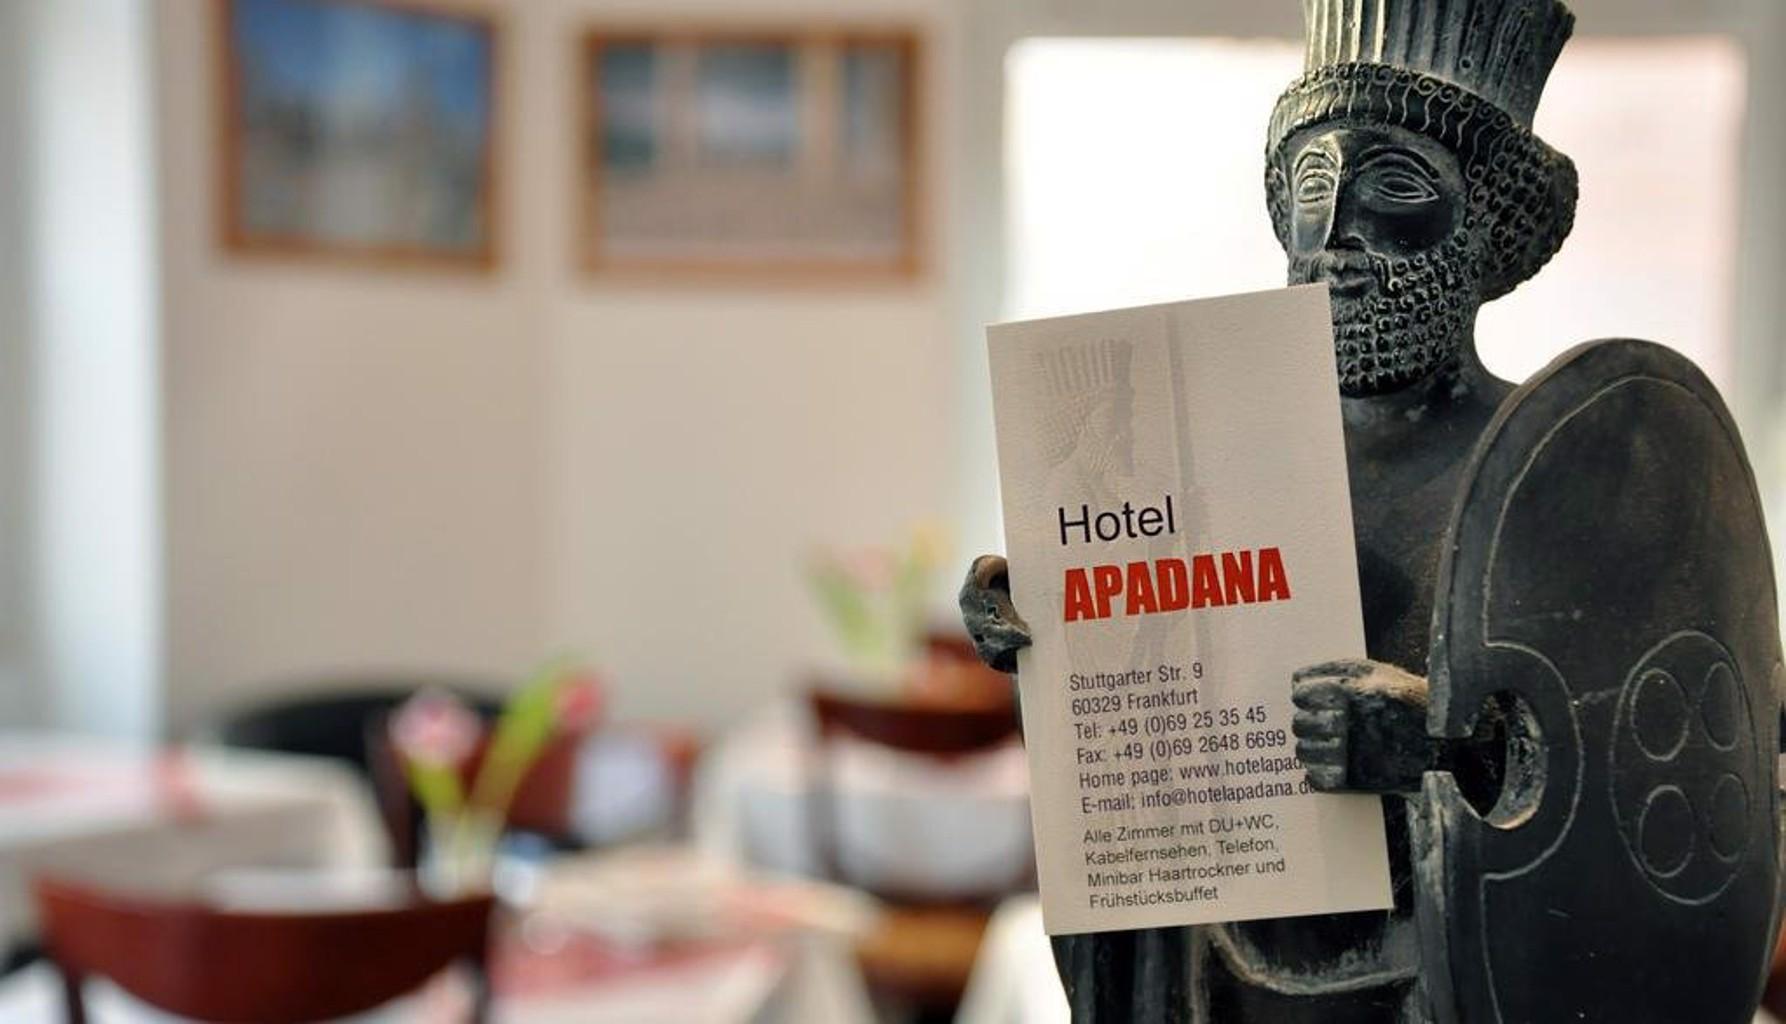 Apadana Hotel